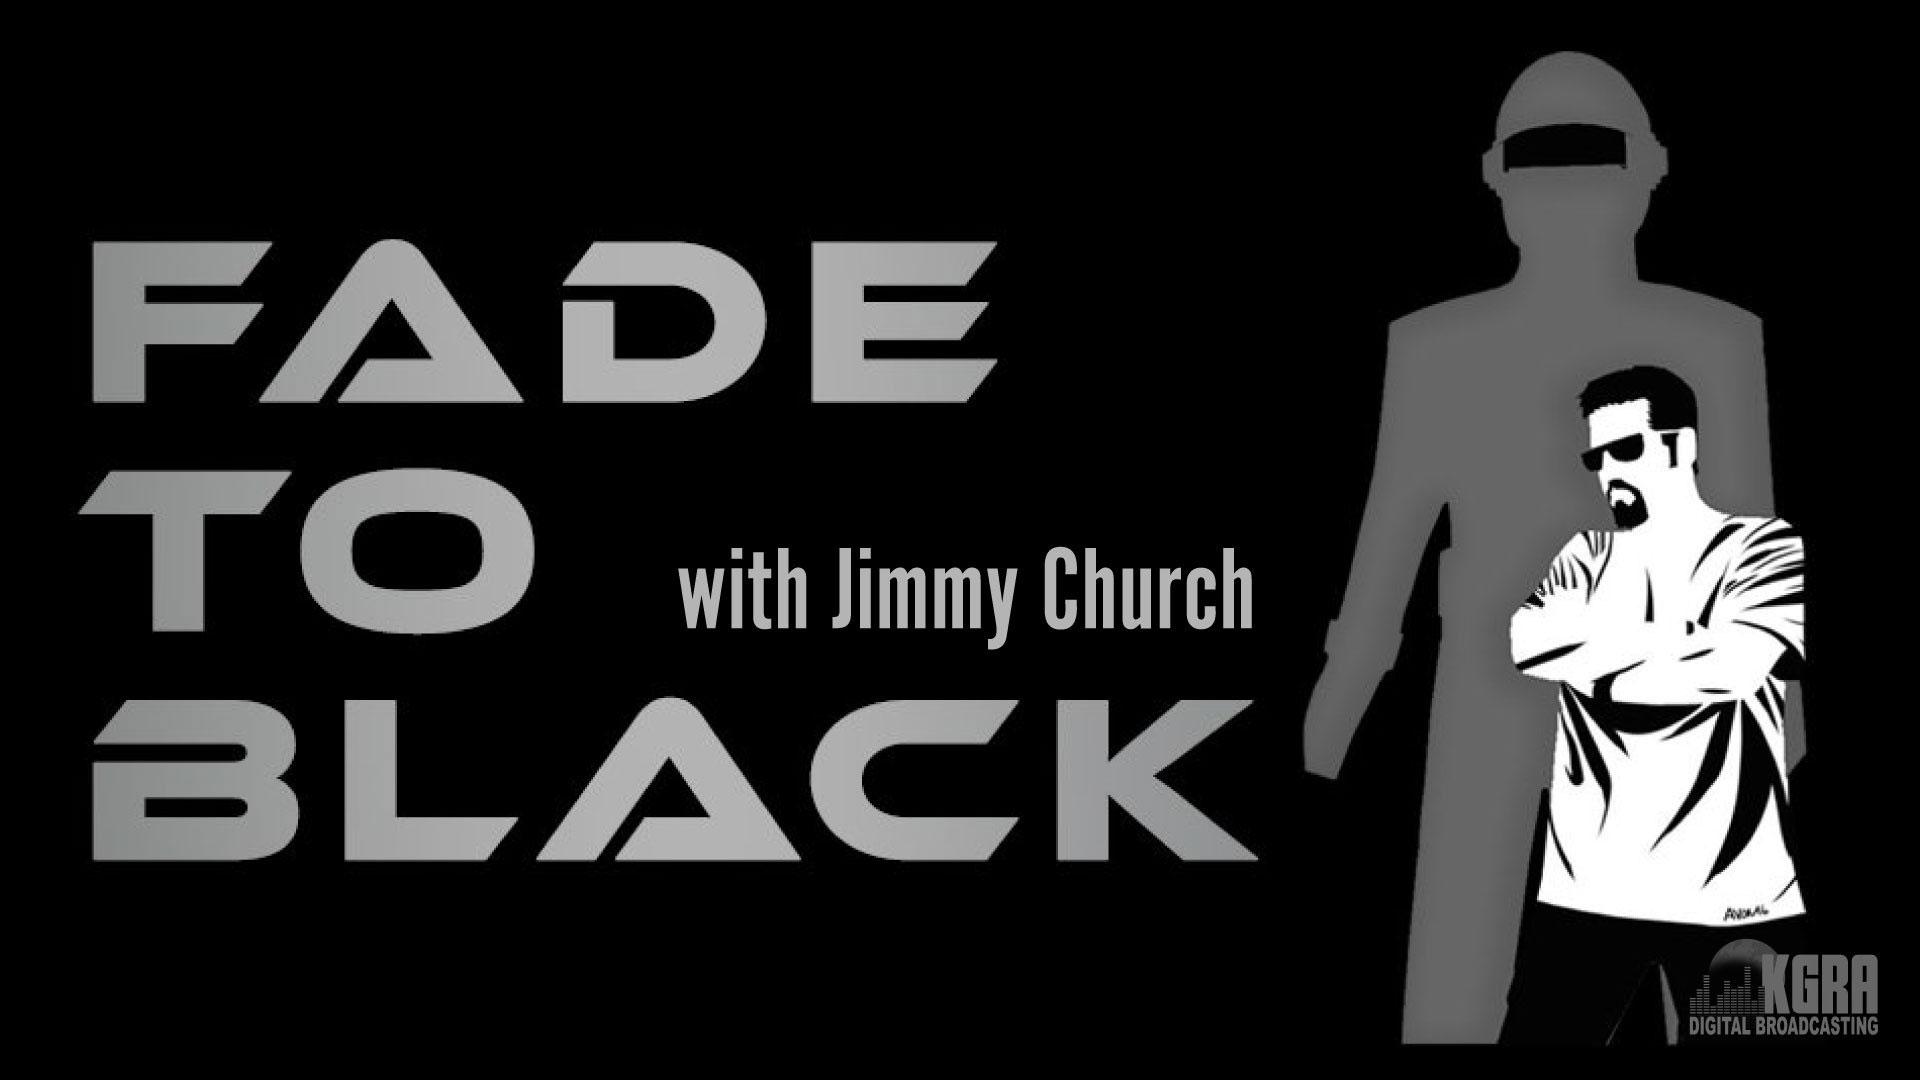 Fade to Black - Jimmy Church